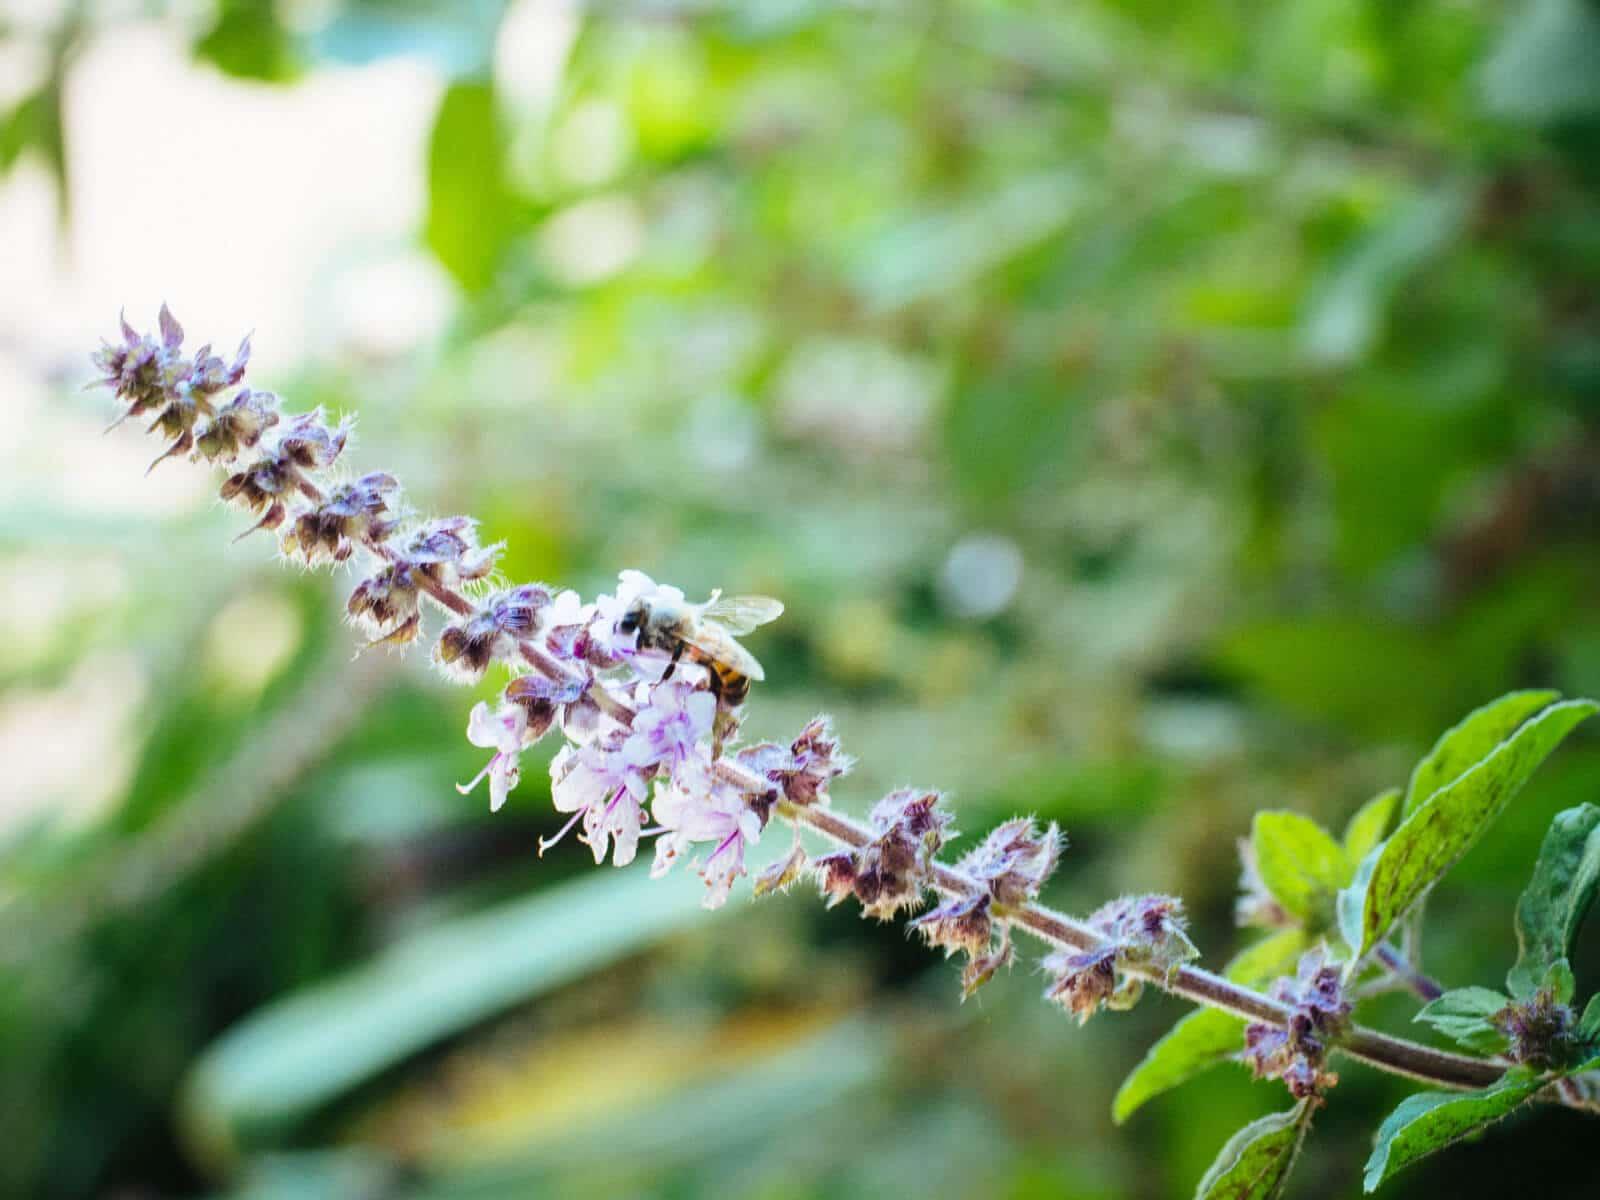 Basil blooms